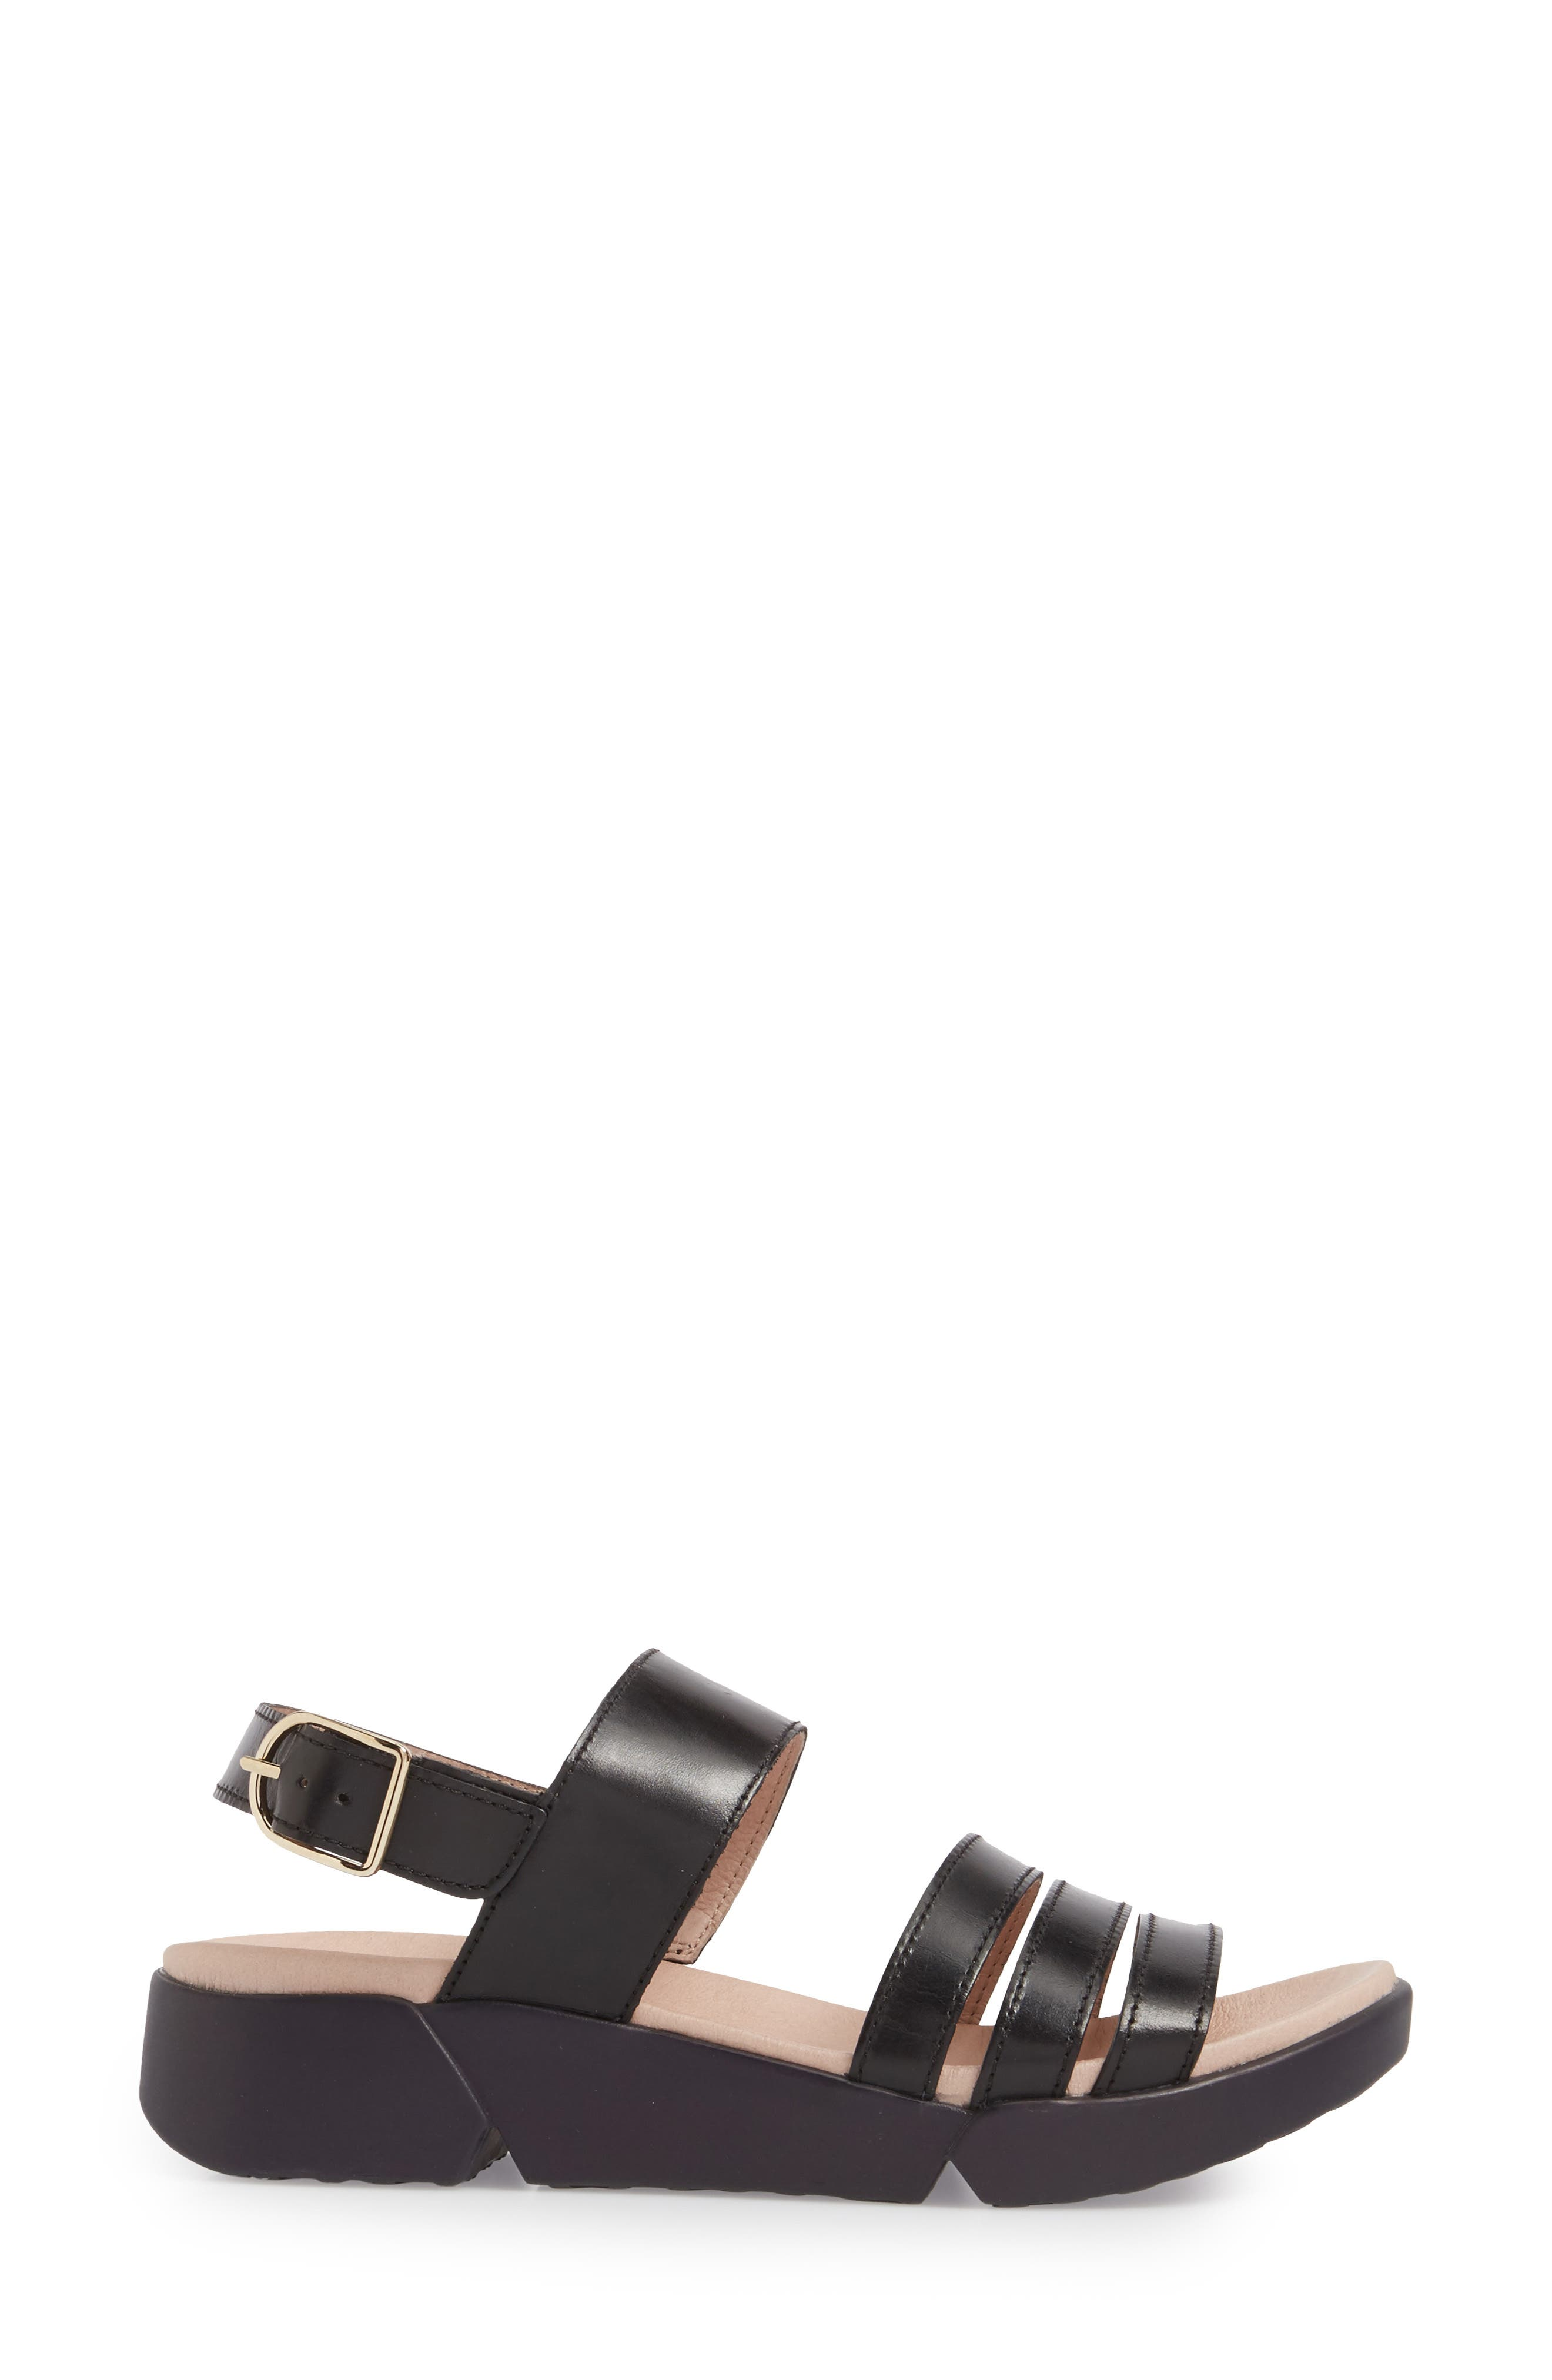 A-8004 Sandal,                             Alternate thumbnail 3, color,                             BLACK LEATHER